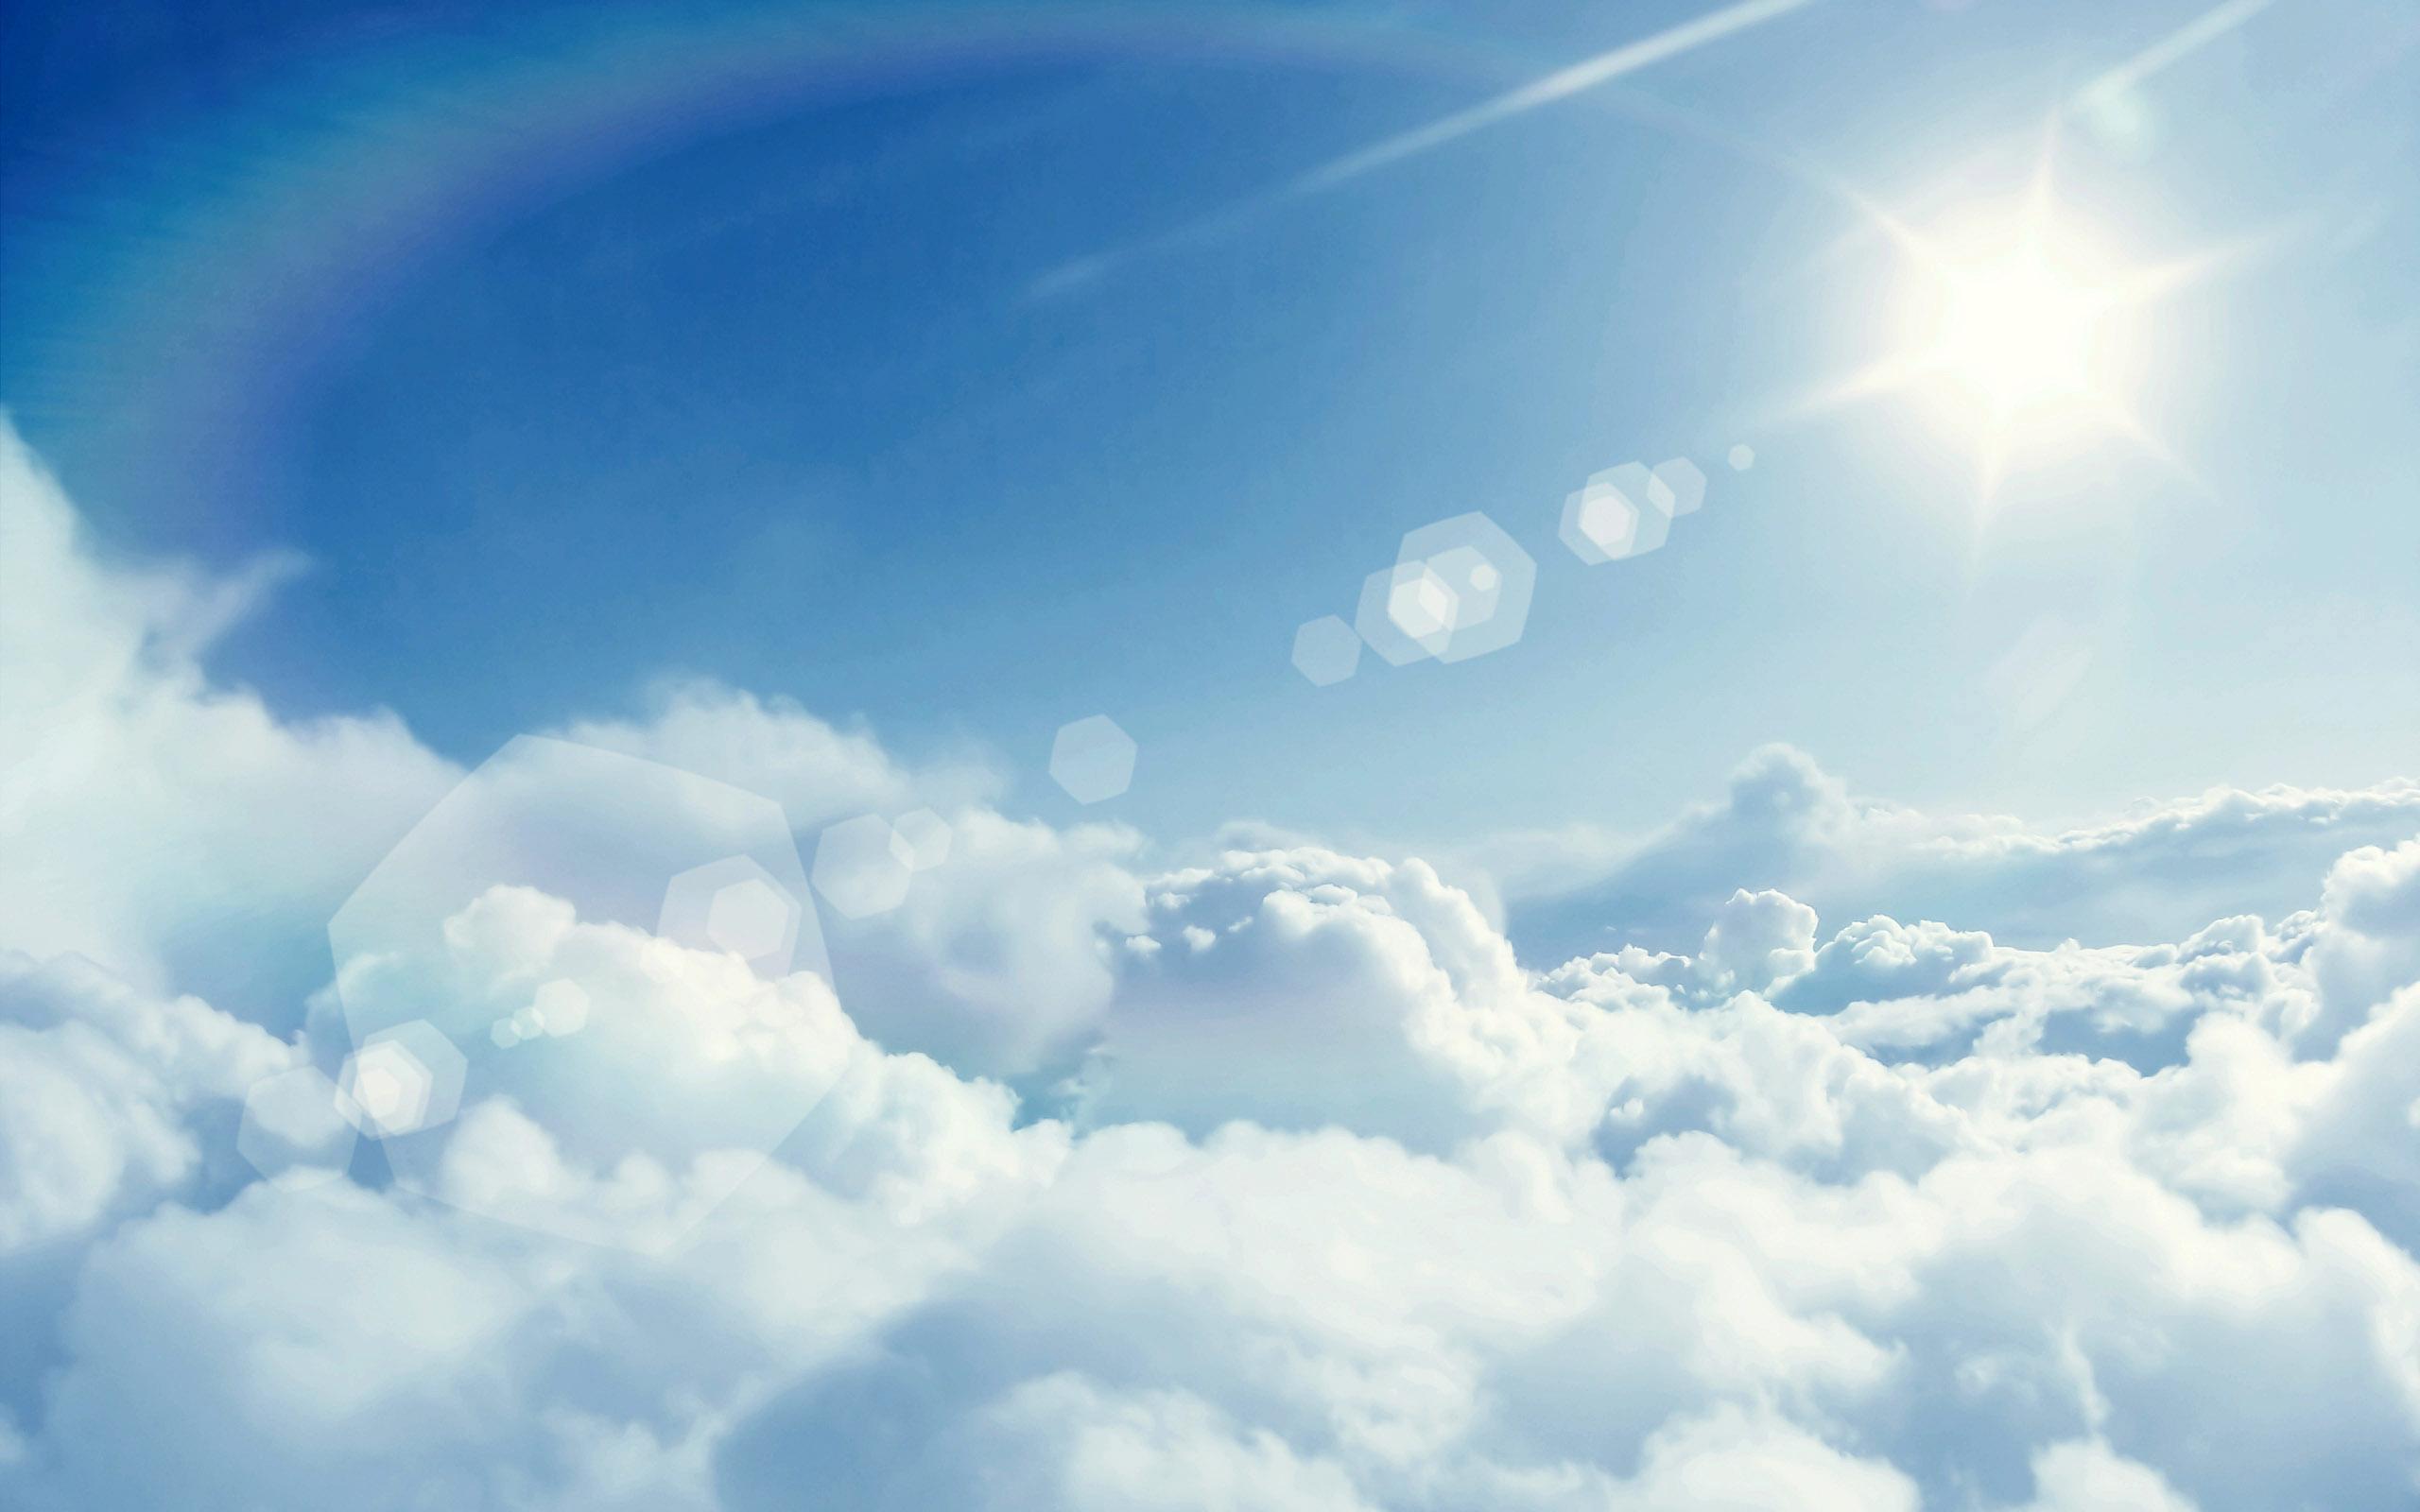 44 Best HD Walls of Cloud, High Definition Cloud Wallpapers